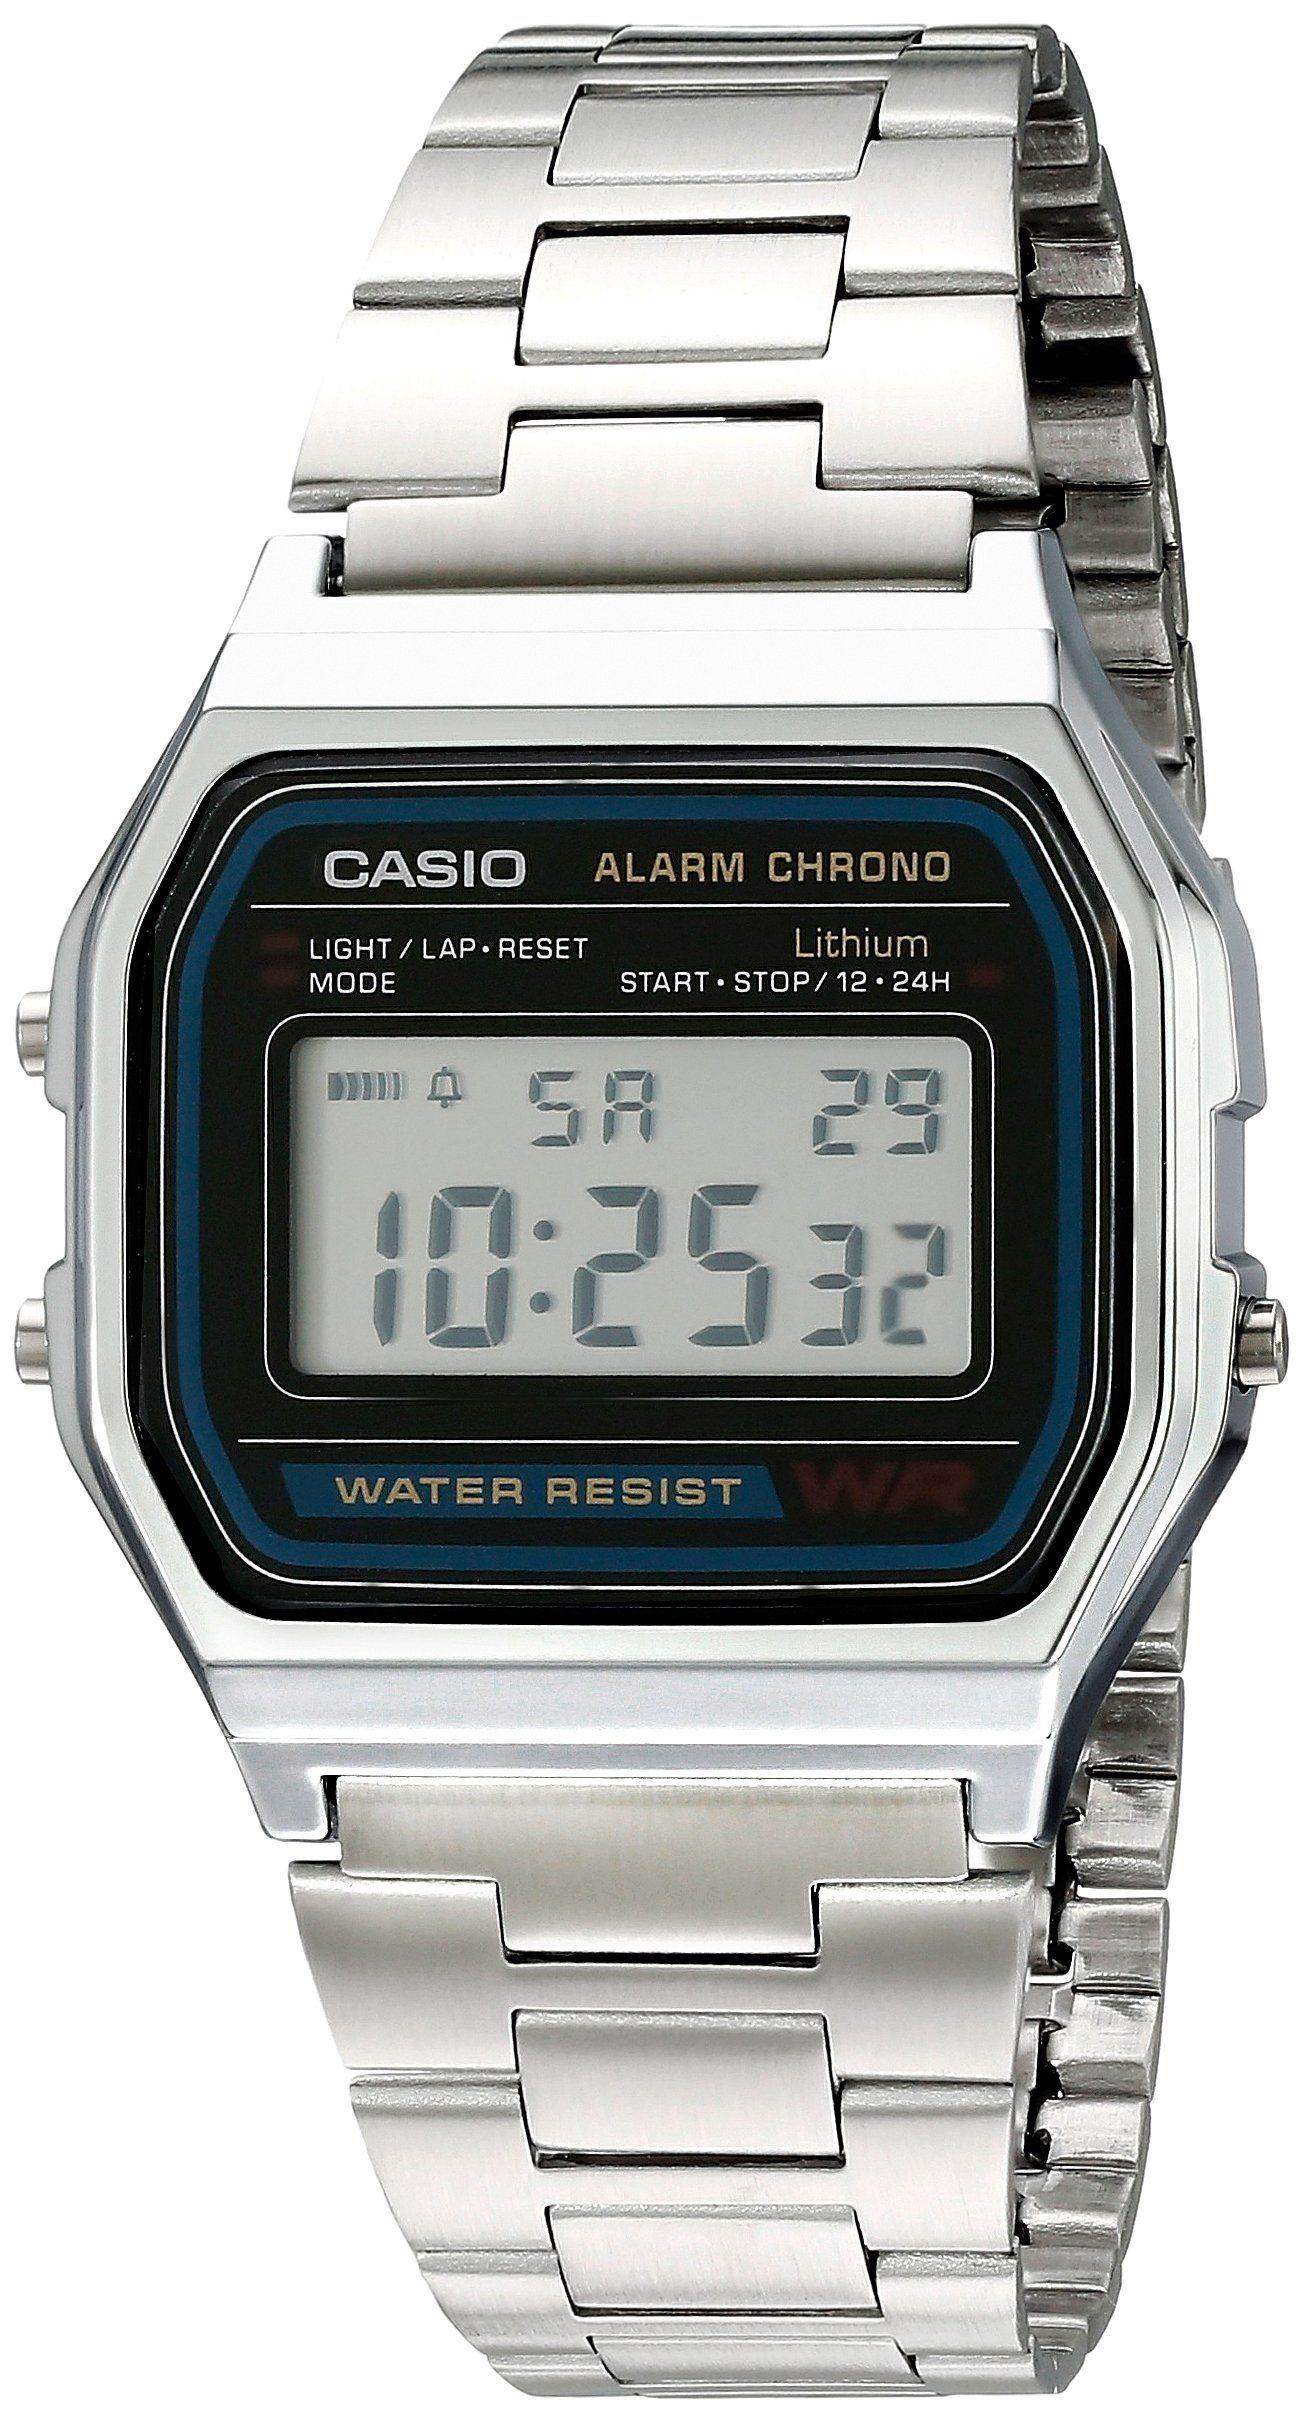 6d2c7f6e2d6 Casio A158WA1Q - Reloj Unisex metálico Negro   Plata  Casio  Amazon.es   Relojes